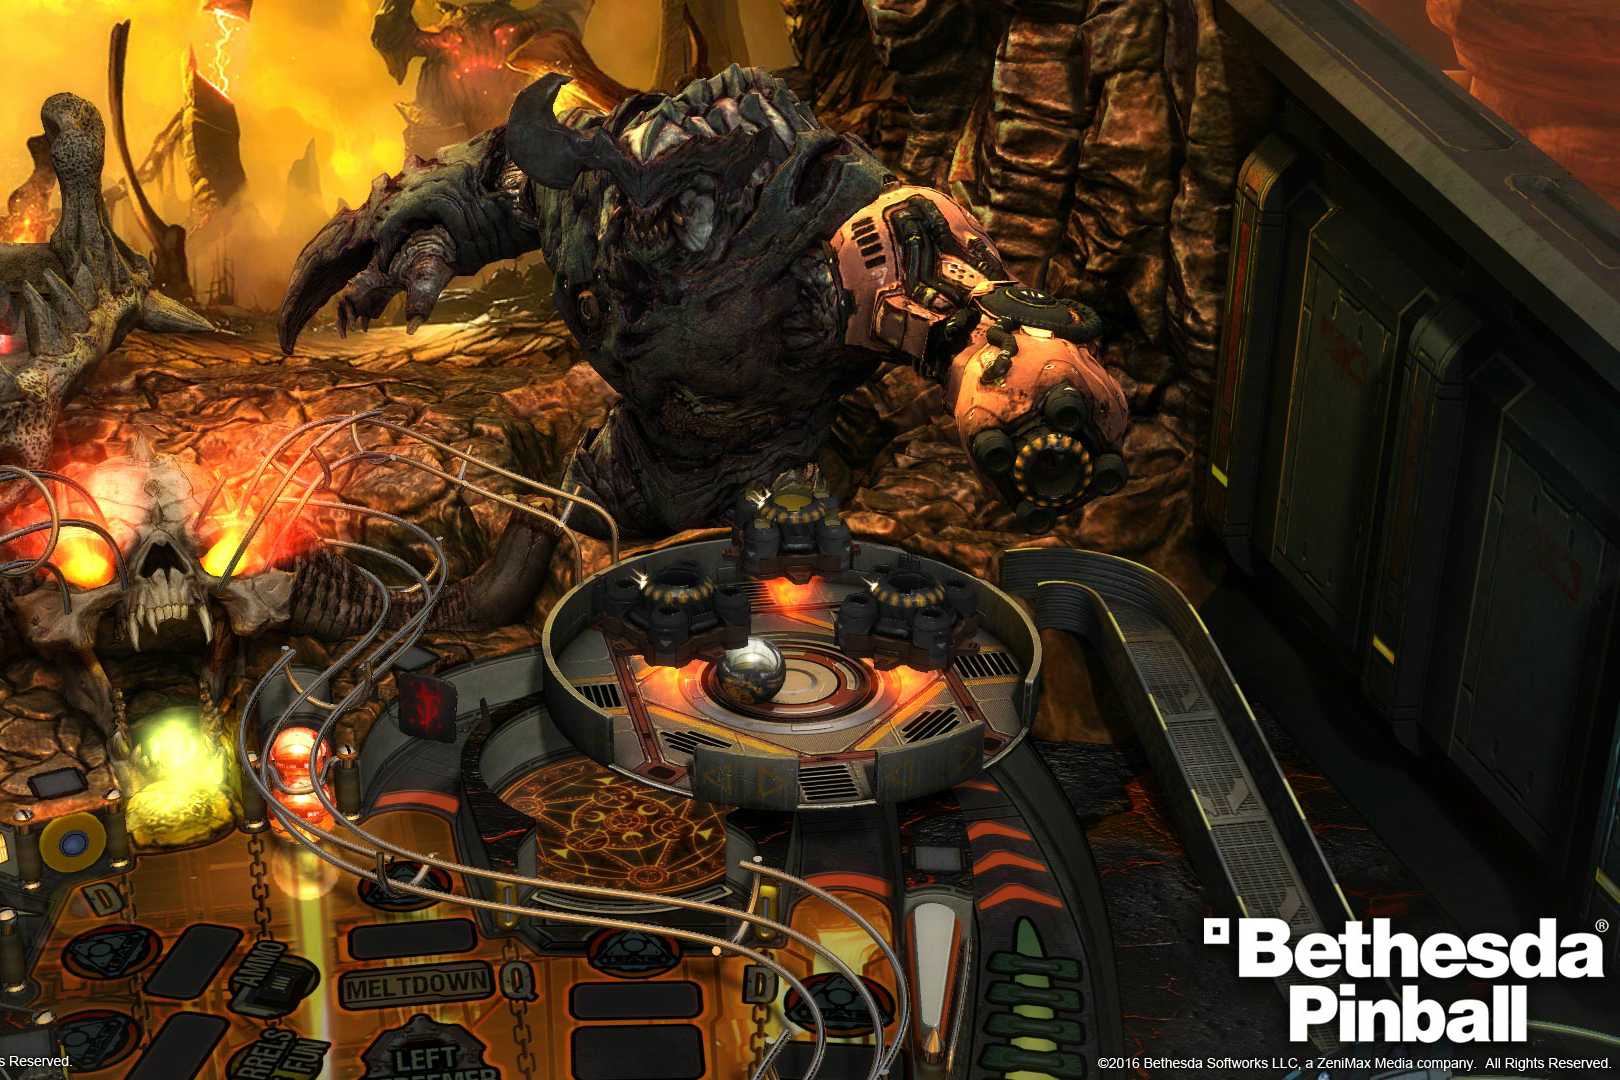 Bethesda-Pinball-Screenshot-3.jpg